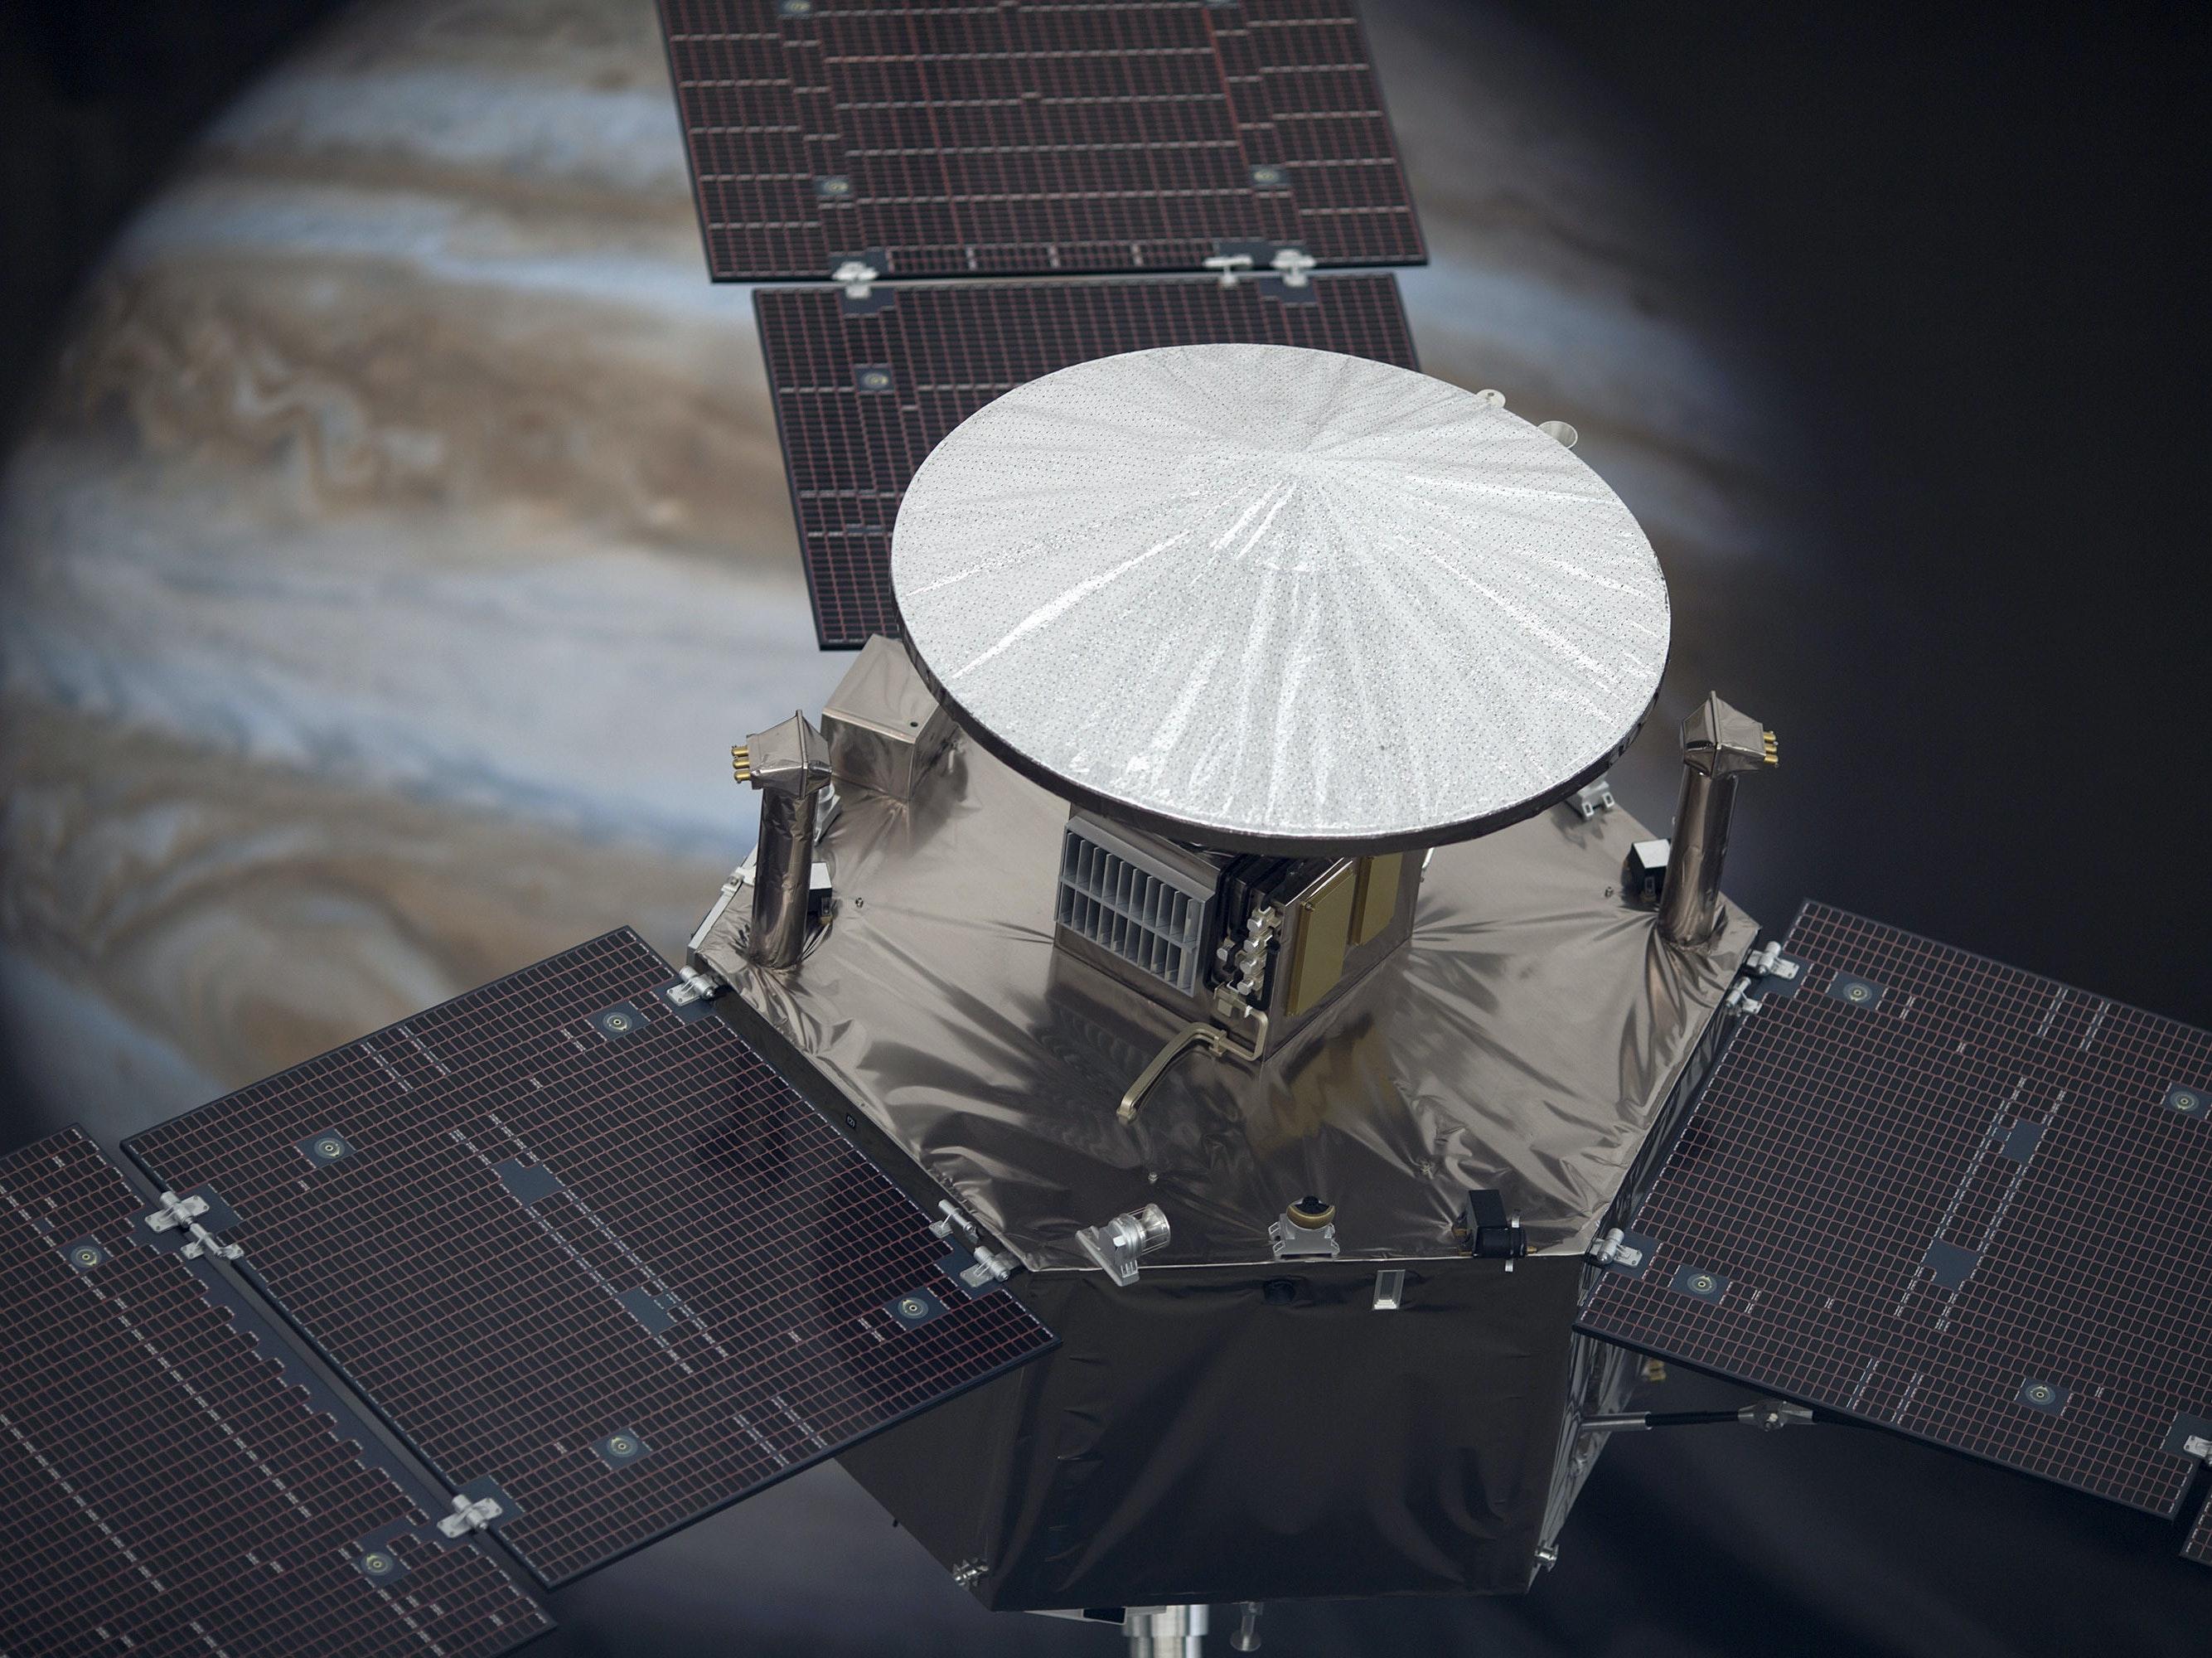 NASA Will Explain Why Juno's Hit a Snag So Far From Home